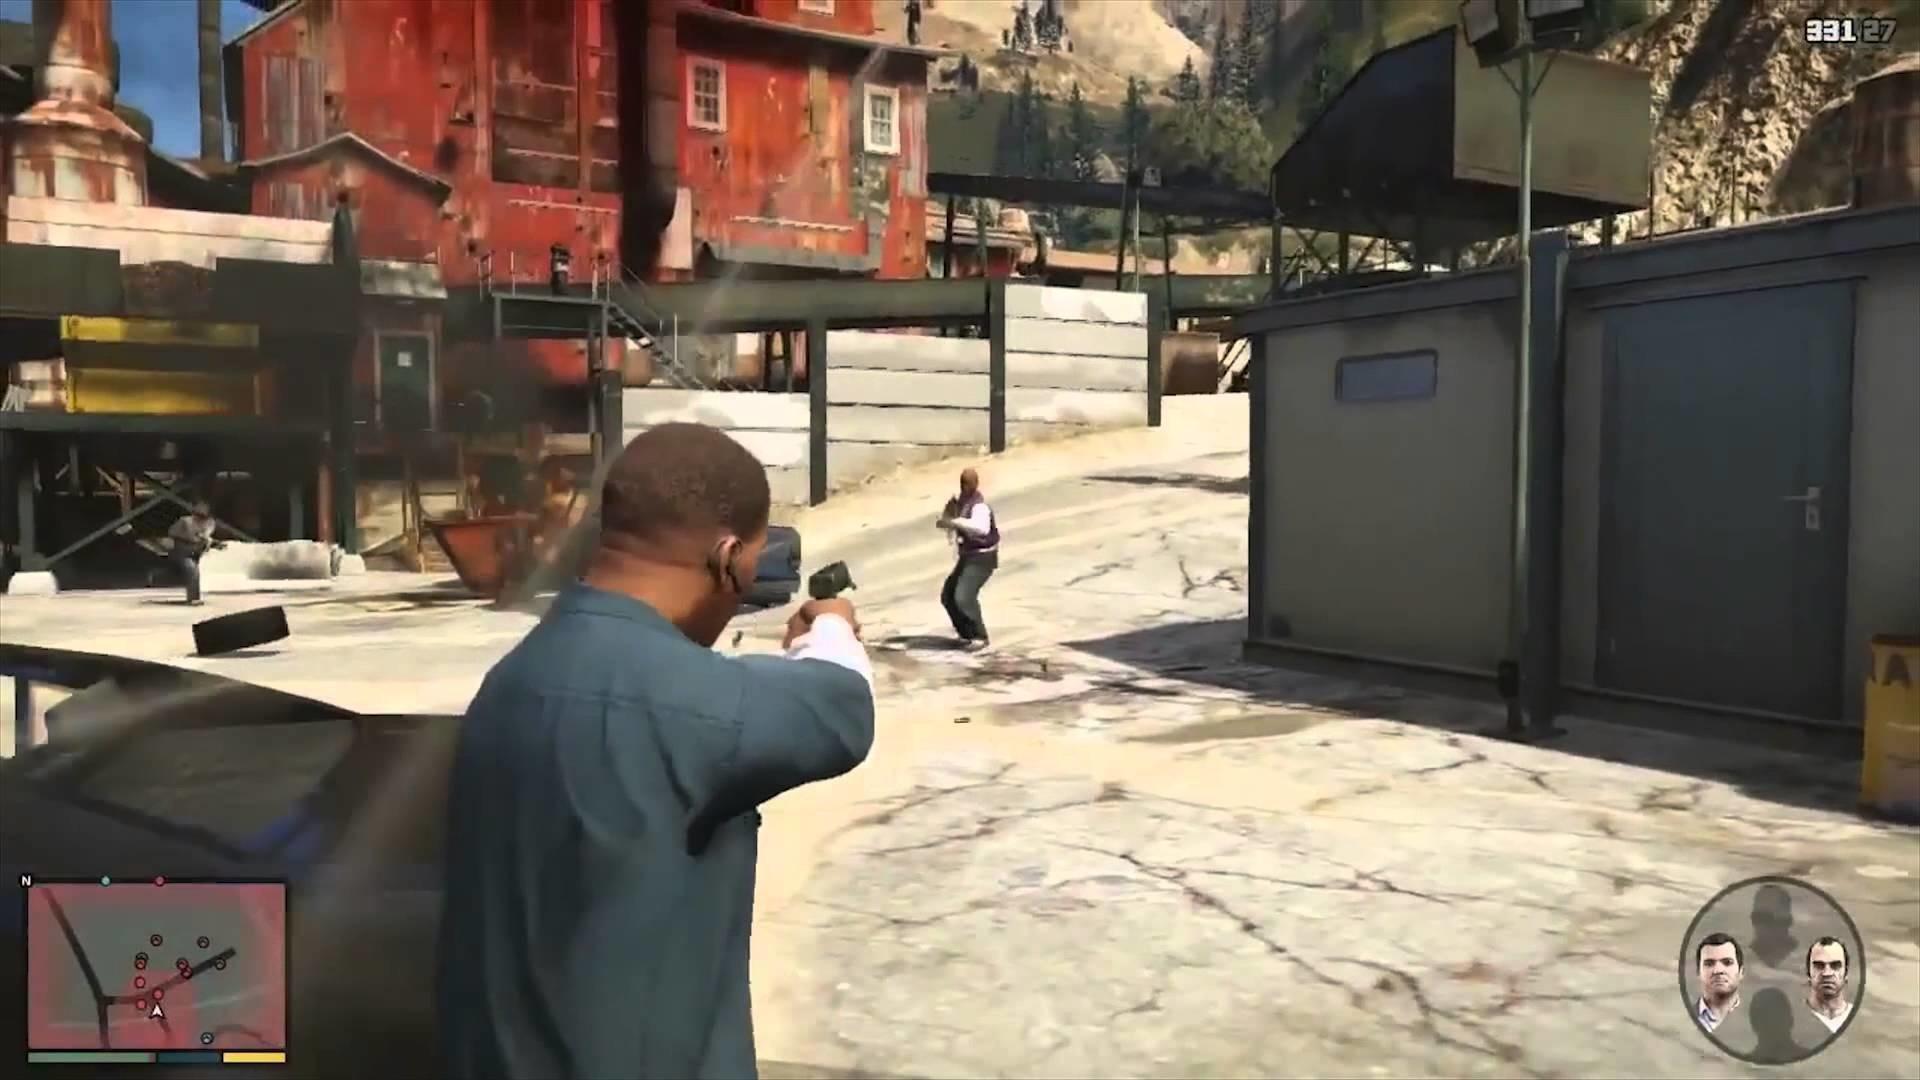 gta 5 gameplay pc video download